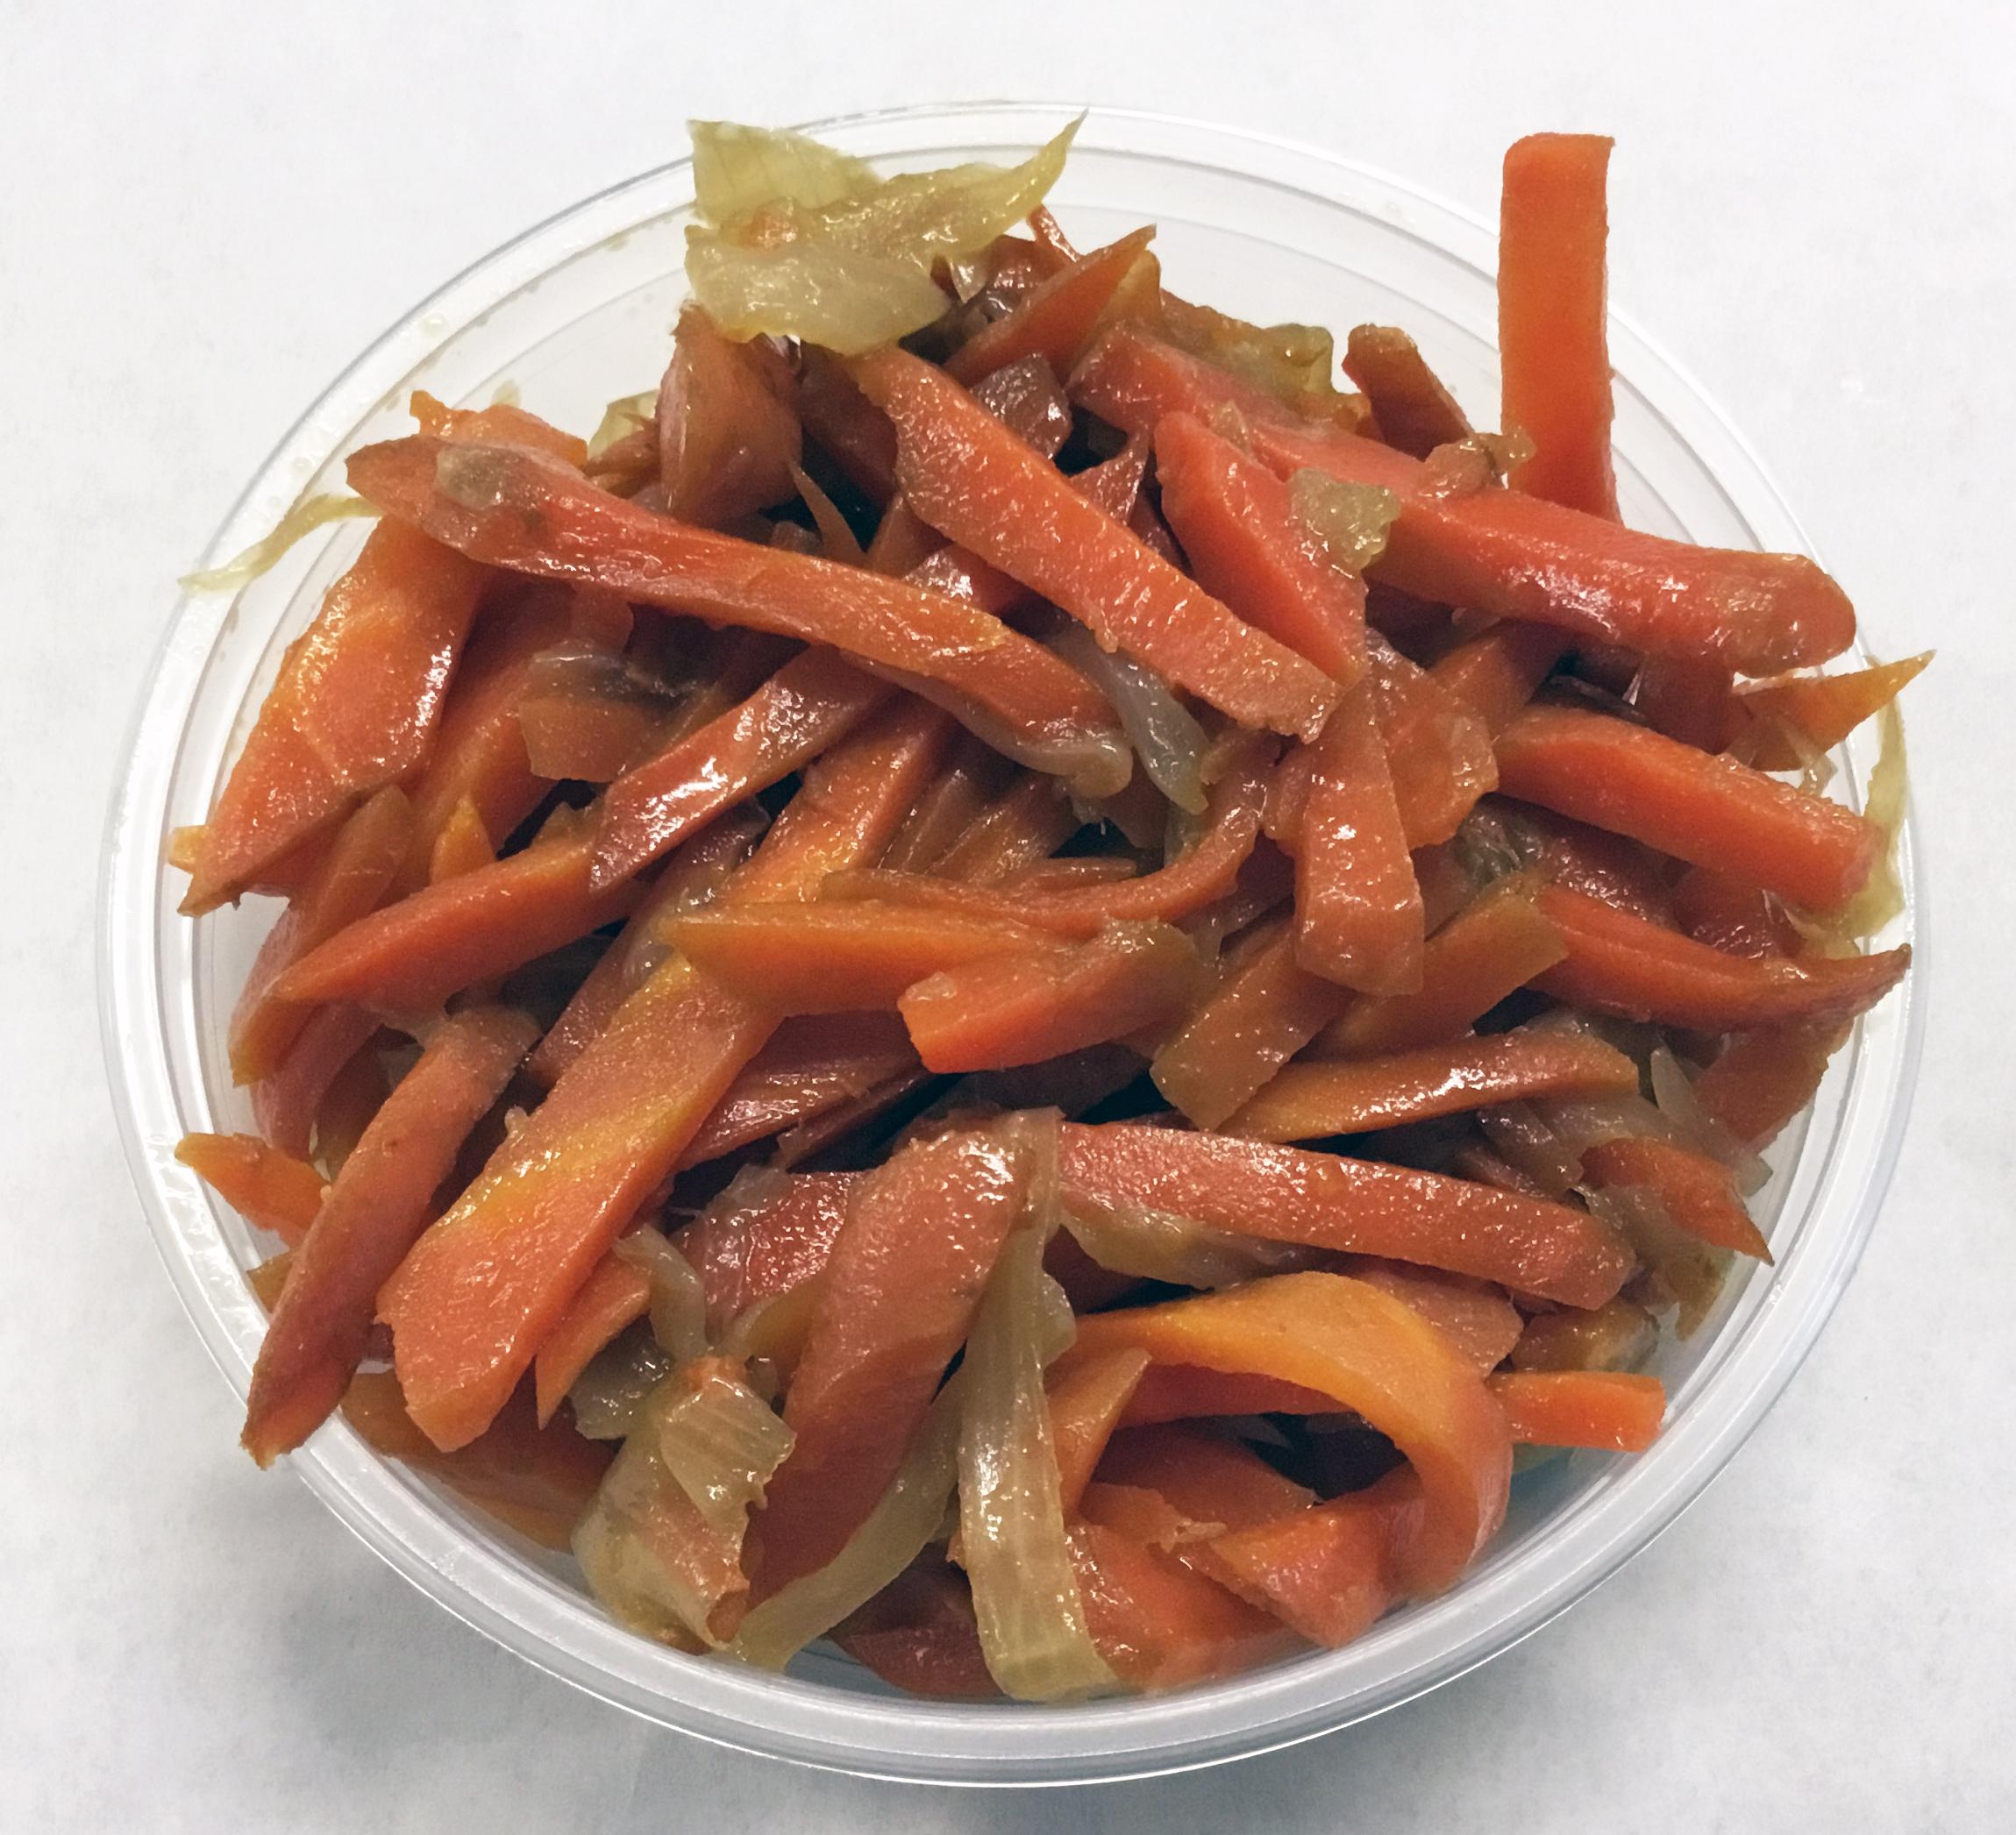 Carrot and onion kinpira.